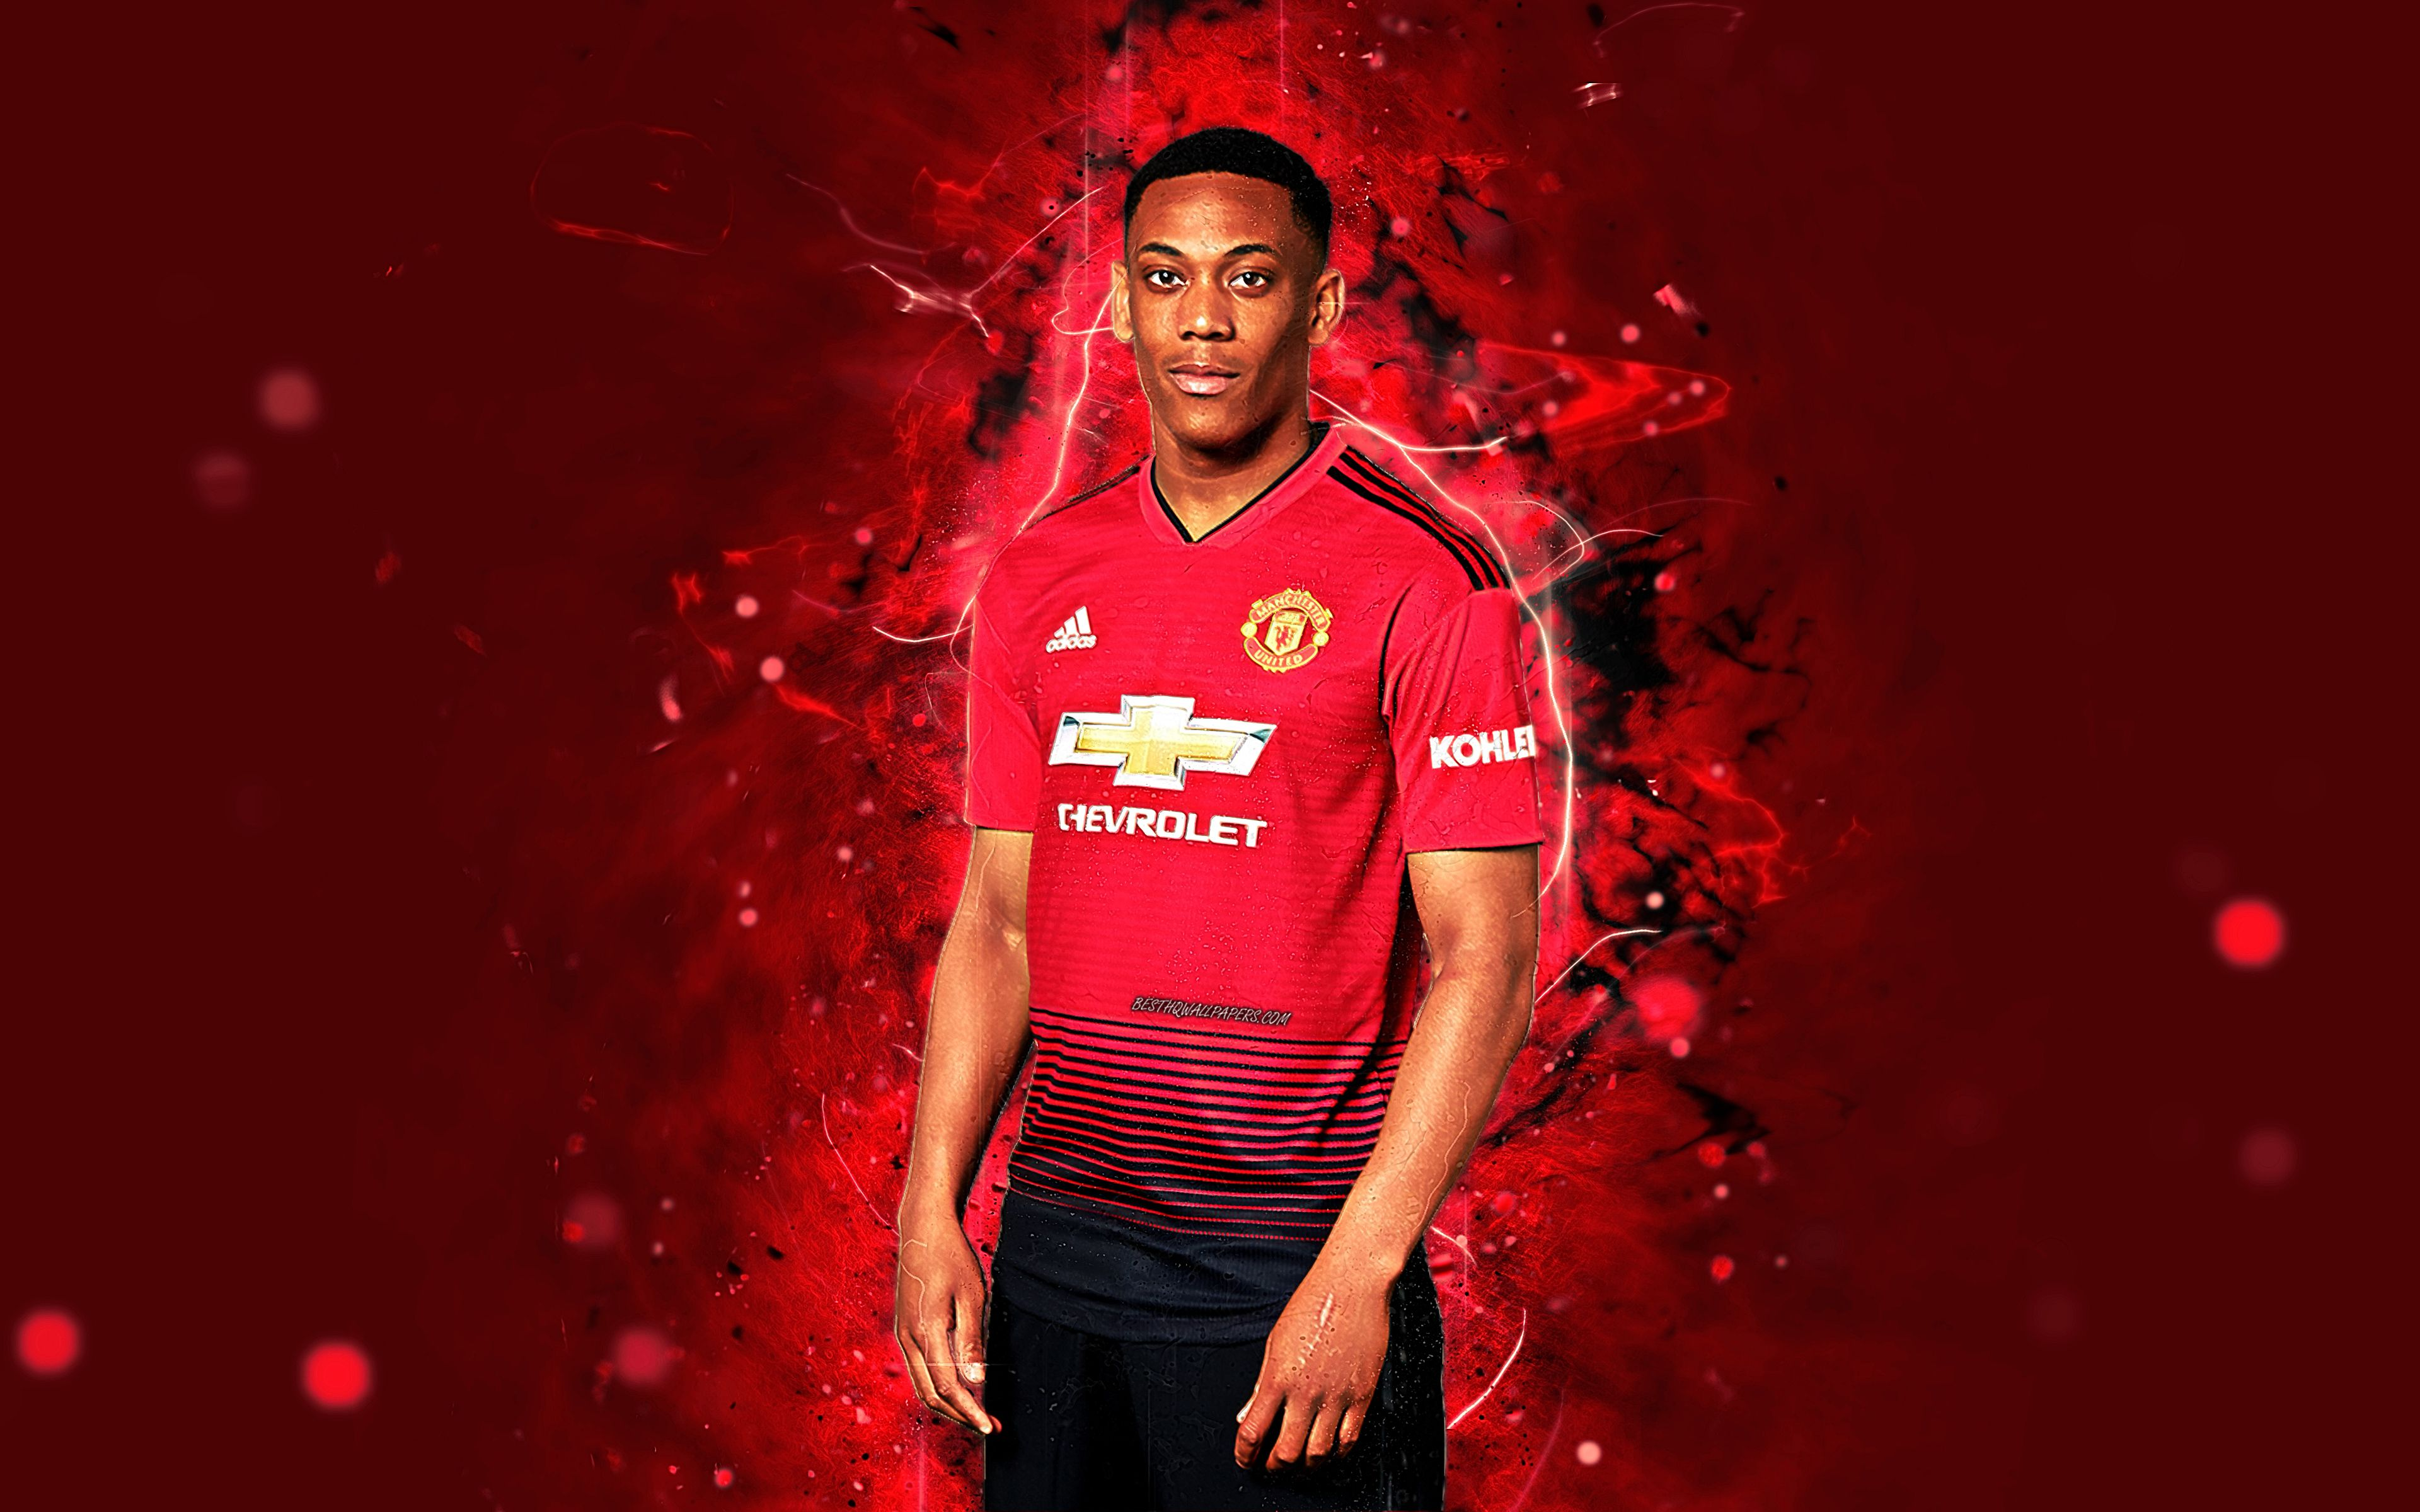 1 2 Jersi Manchester United 2019 HD Wallpaper